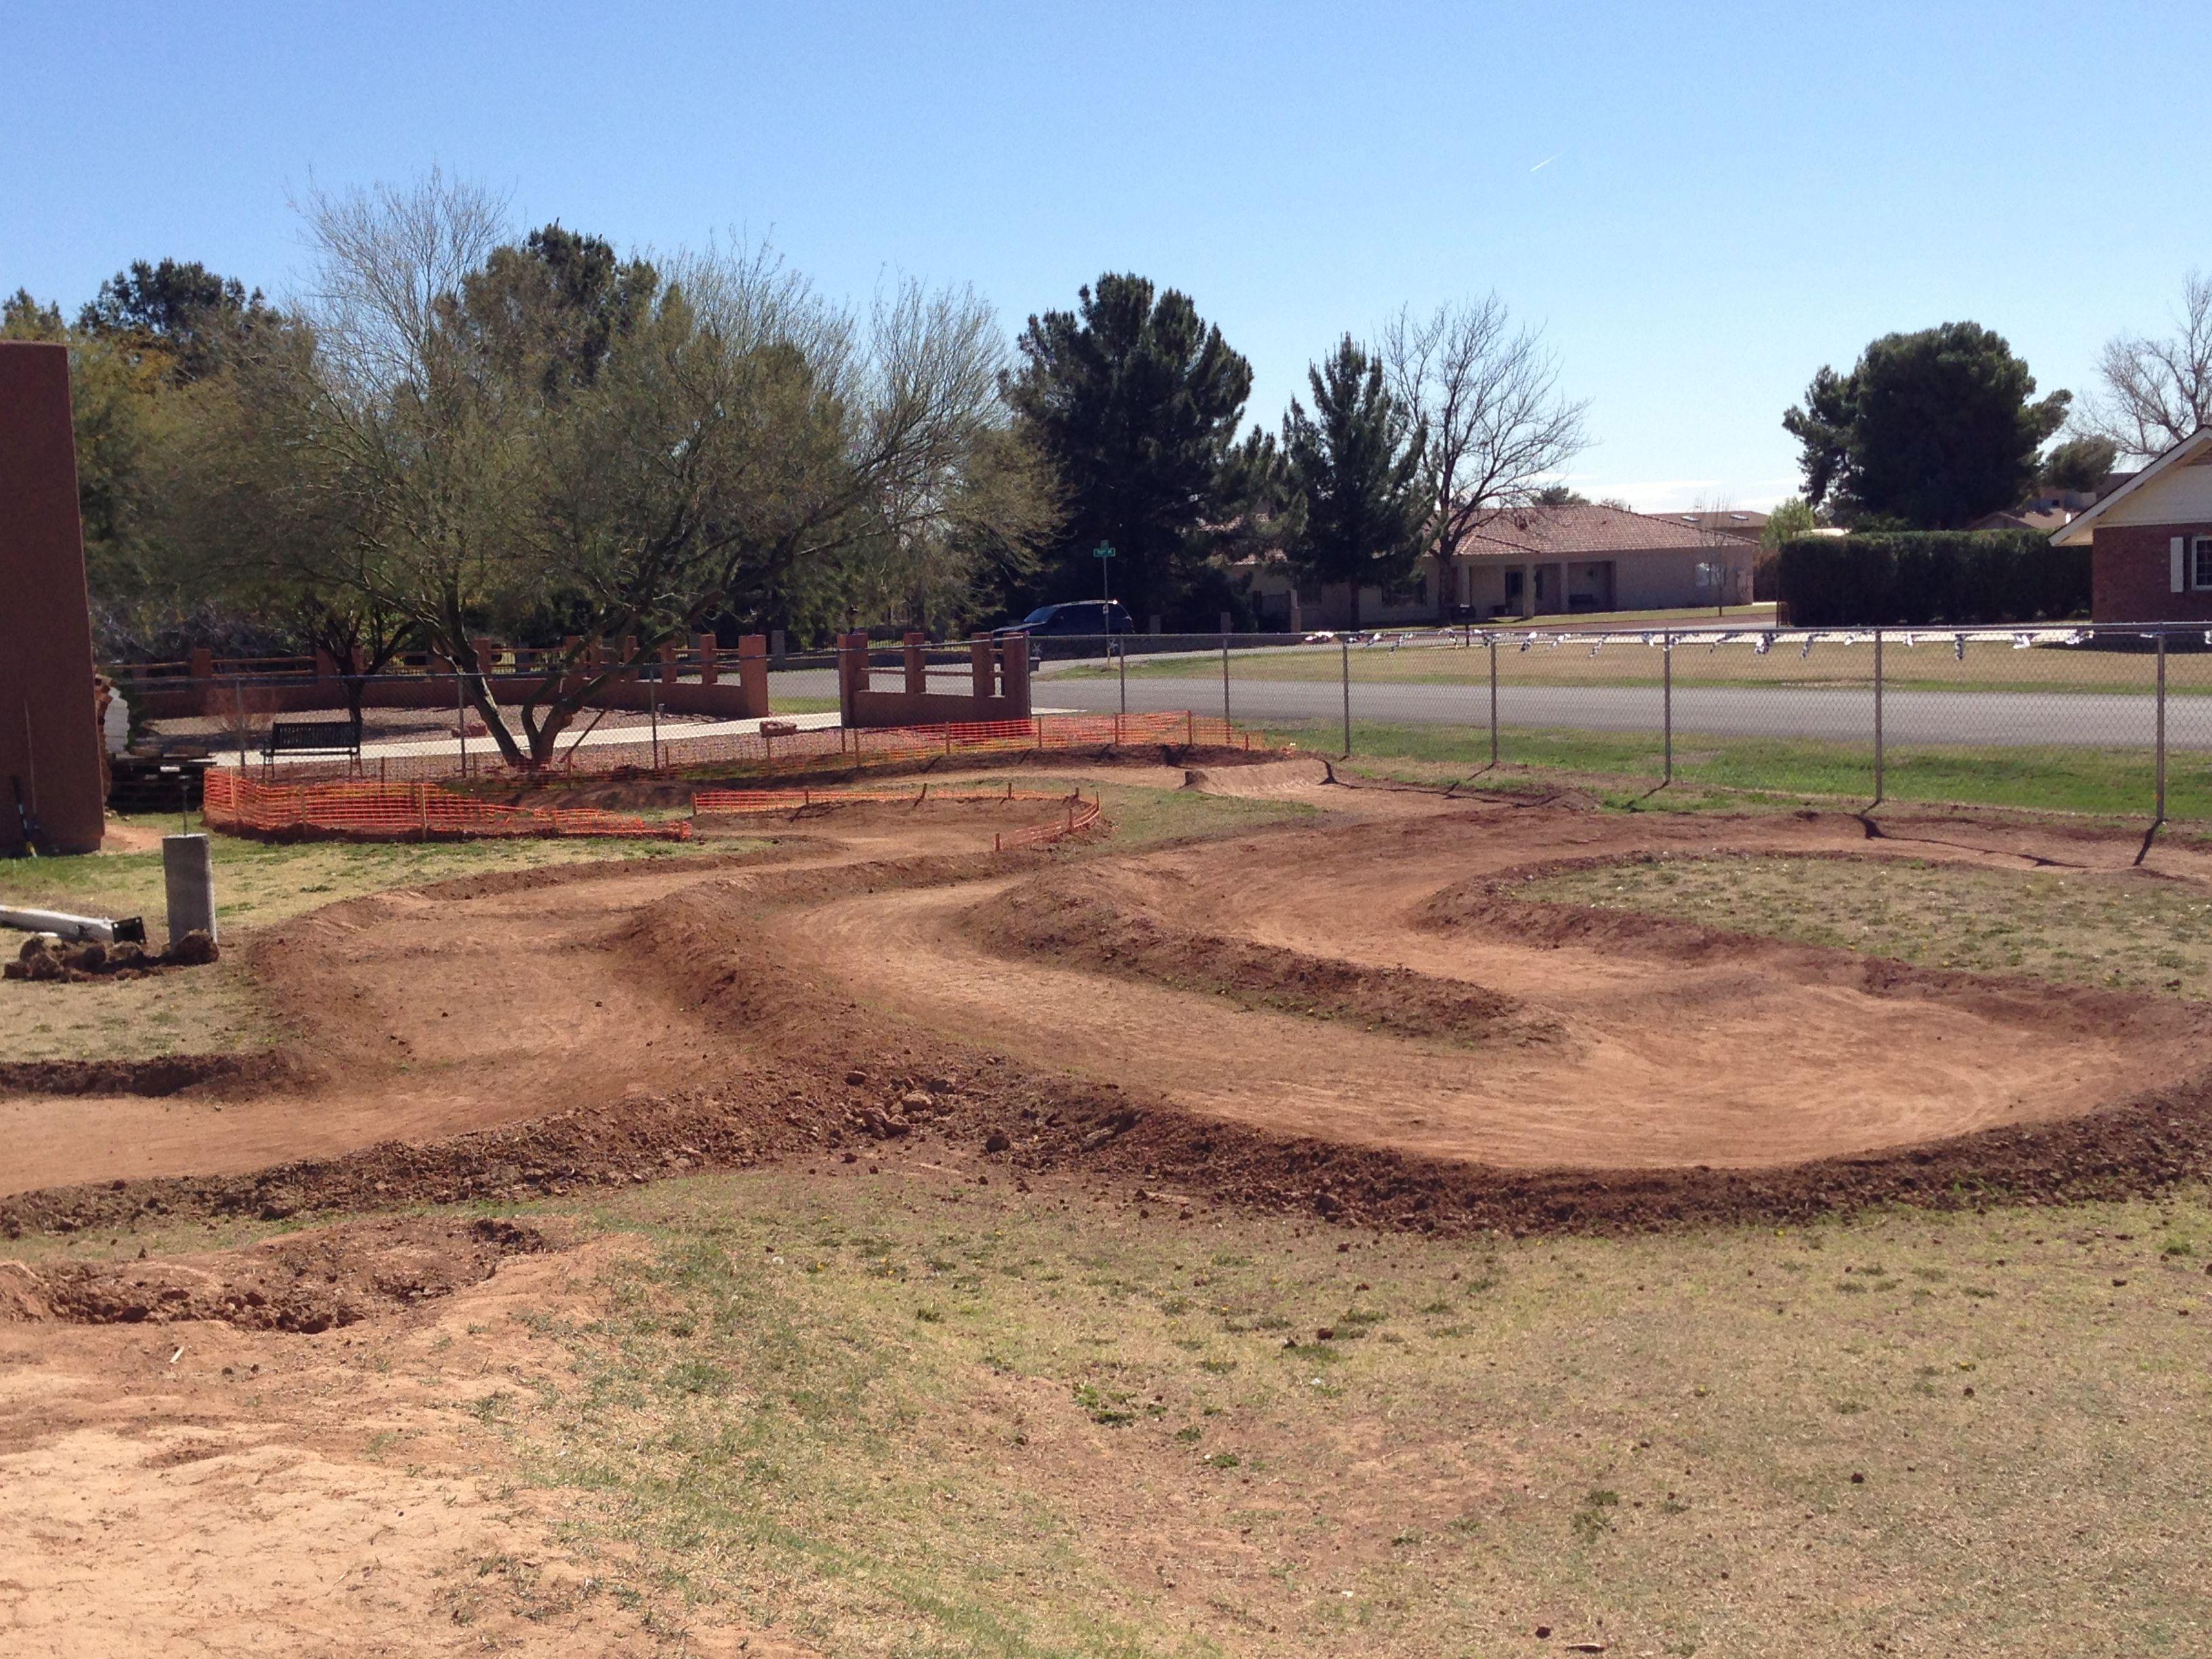 Backyard RC track Rc track, Backyard, Rc car track